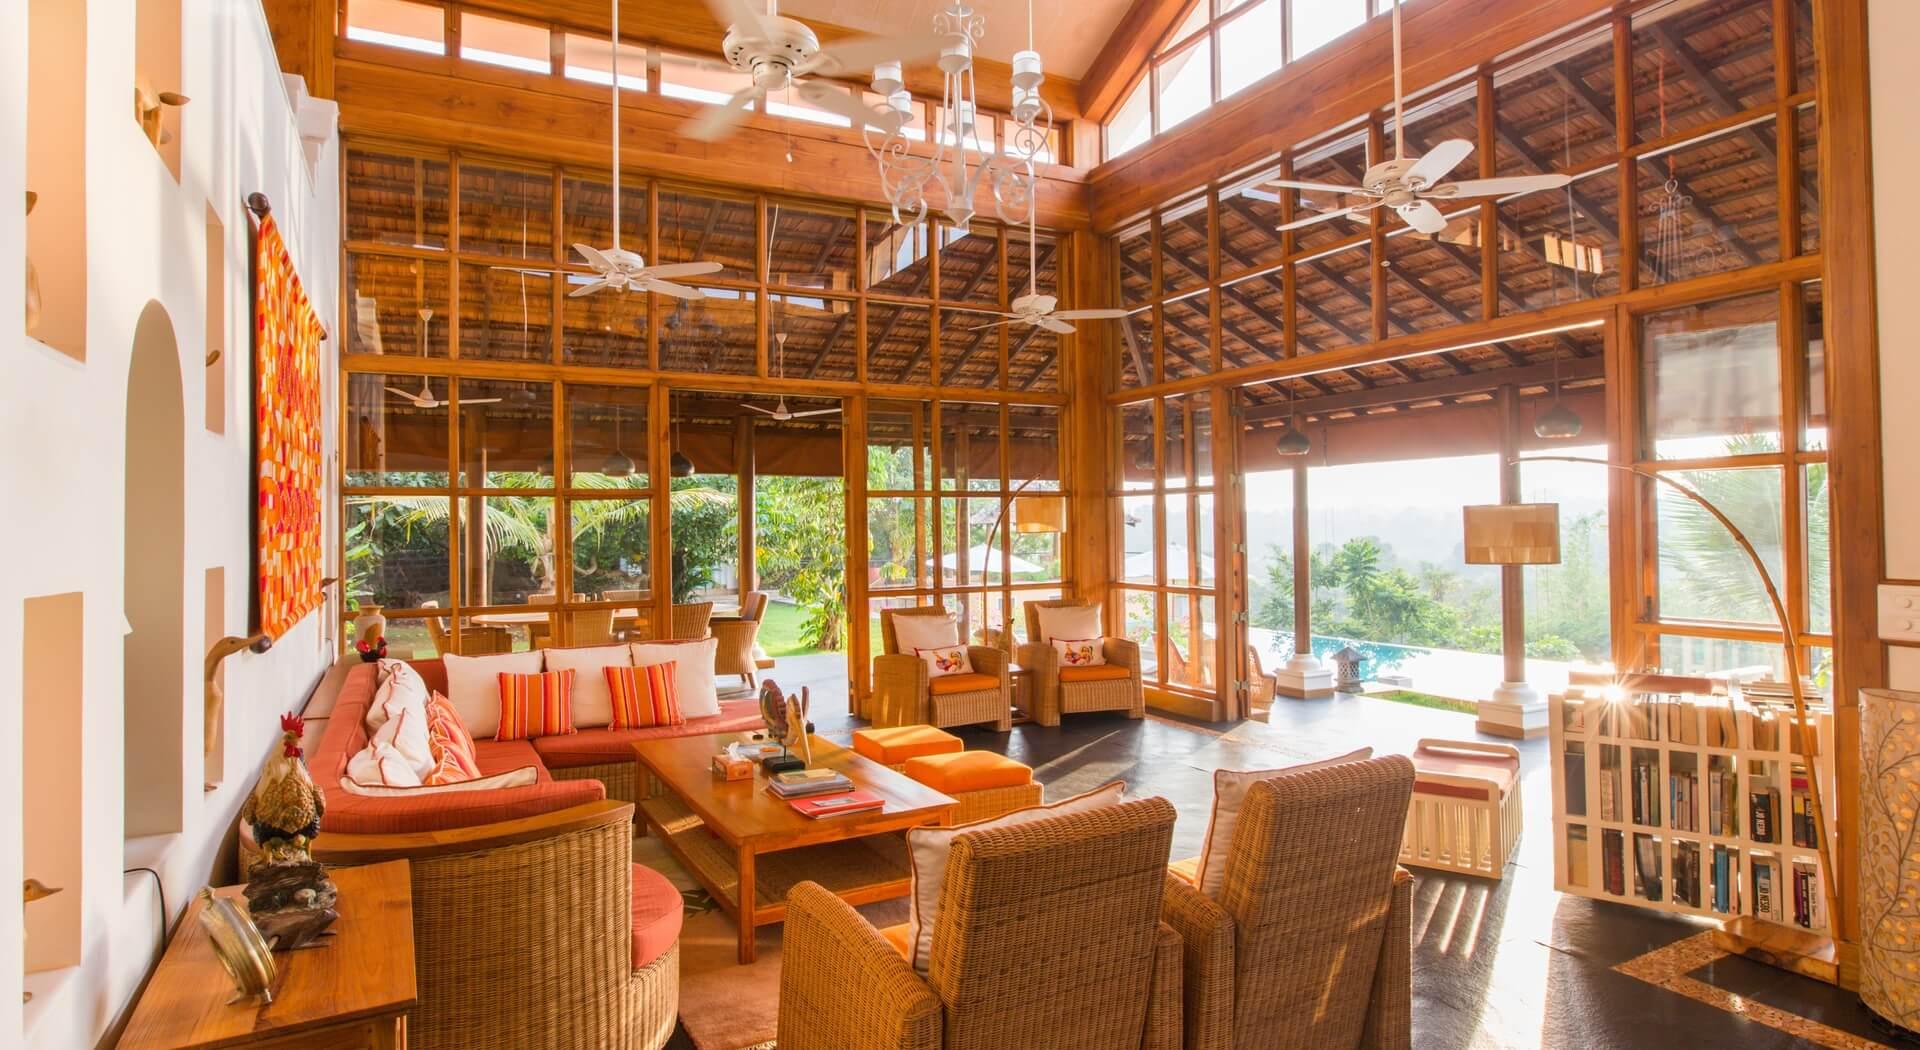 Luxury rental villa in Goa